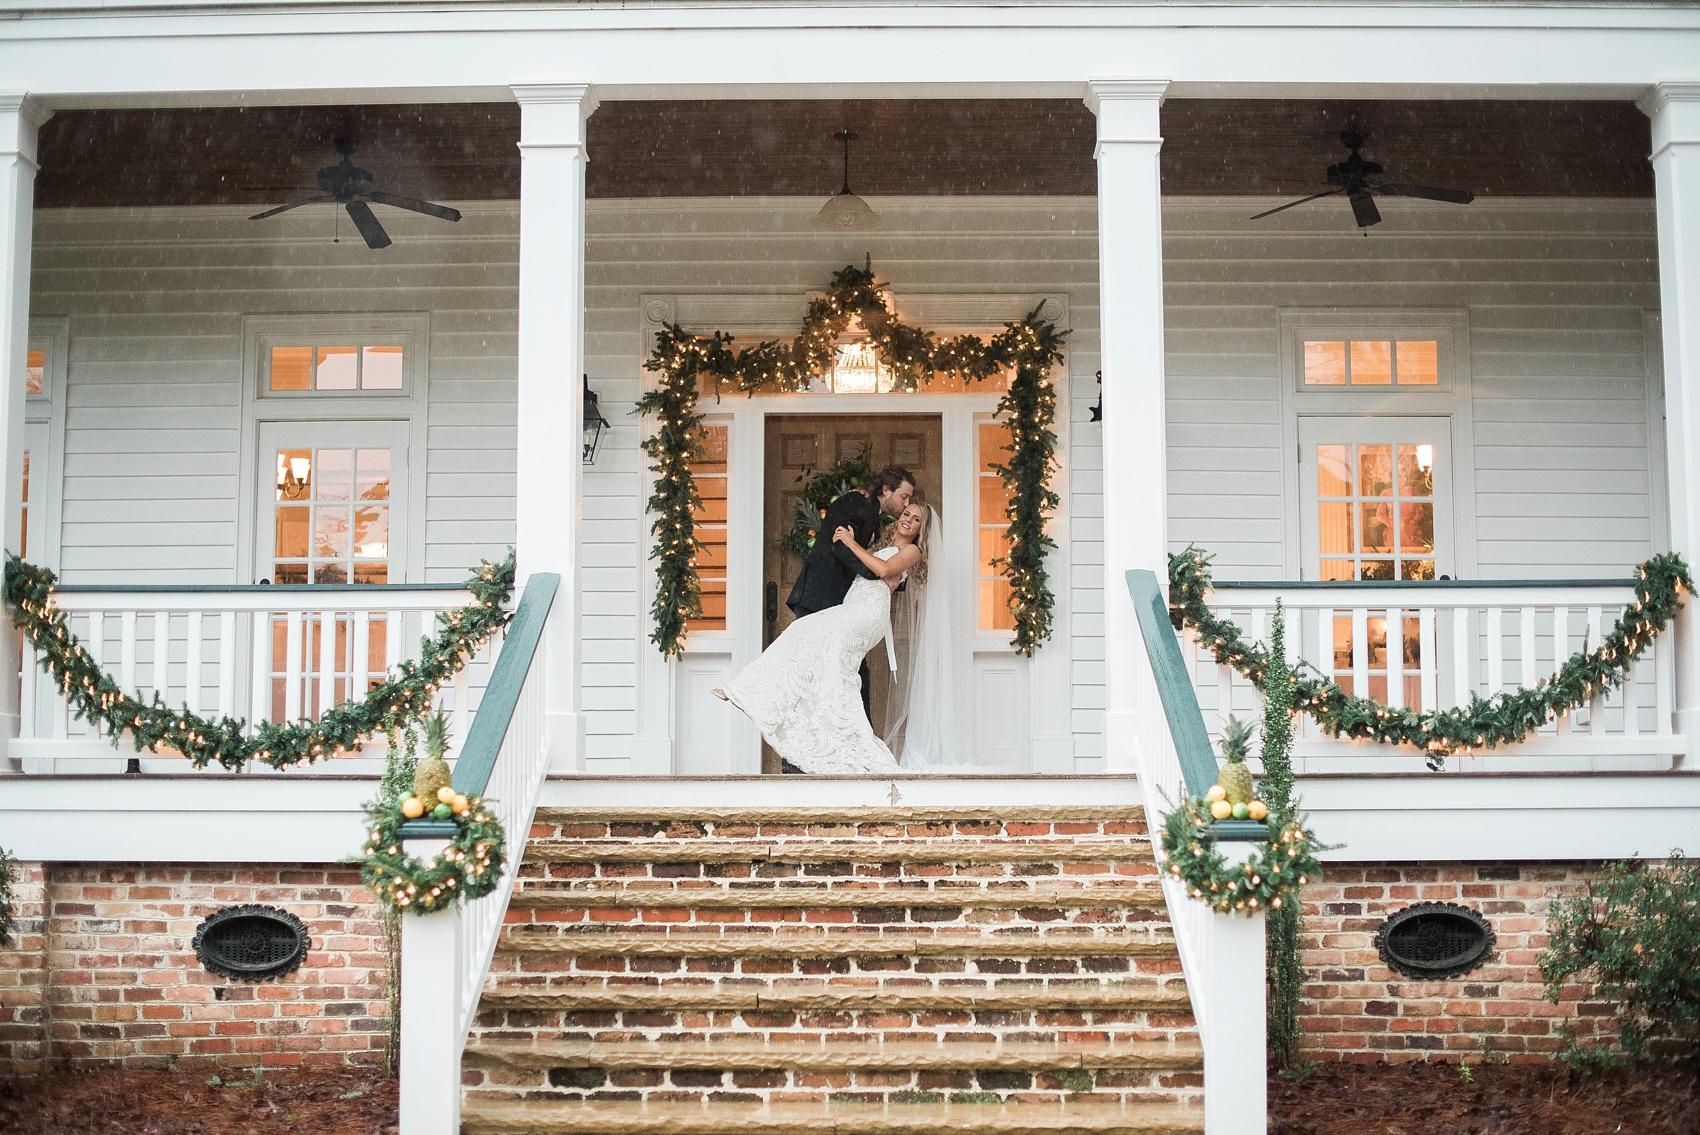 South_carolina_wedding_photographer_0044.jpg